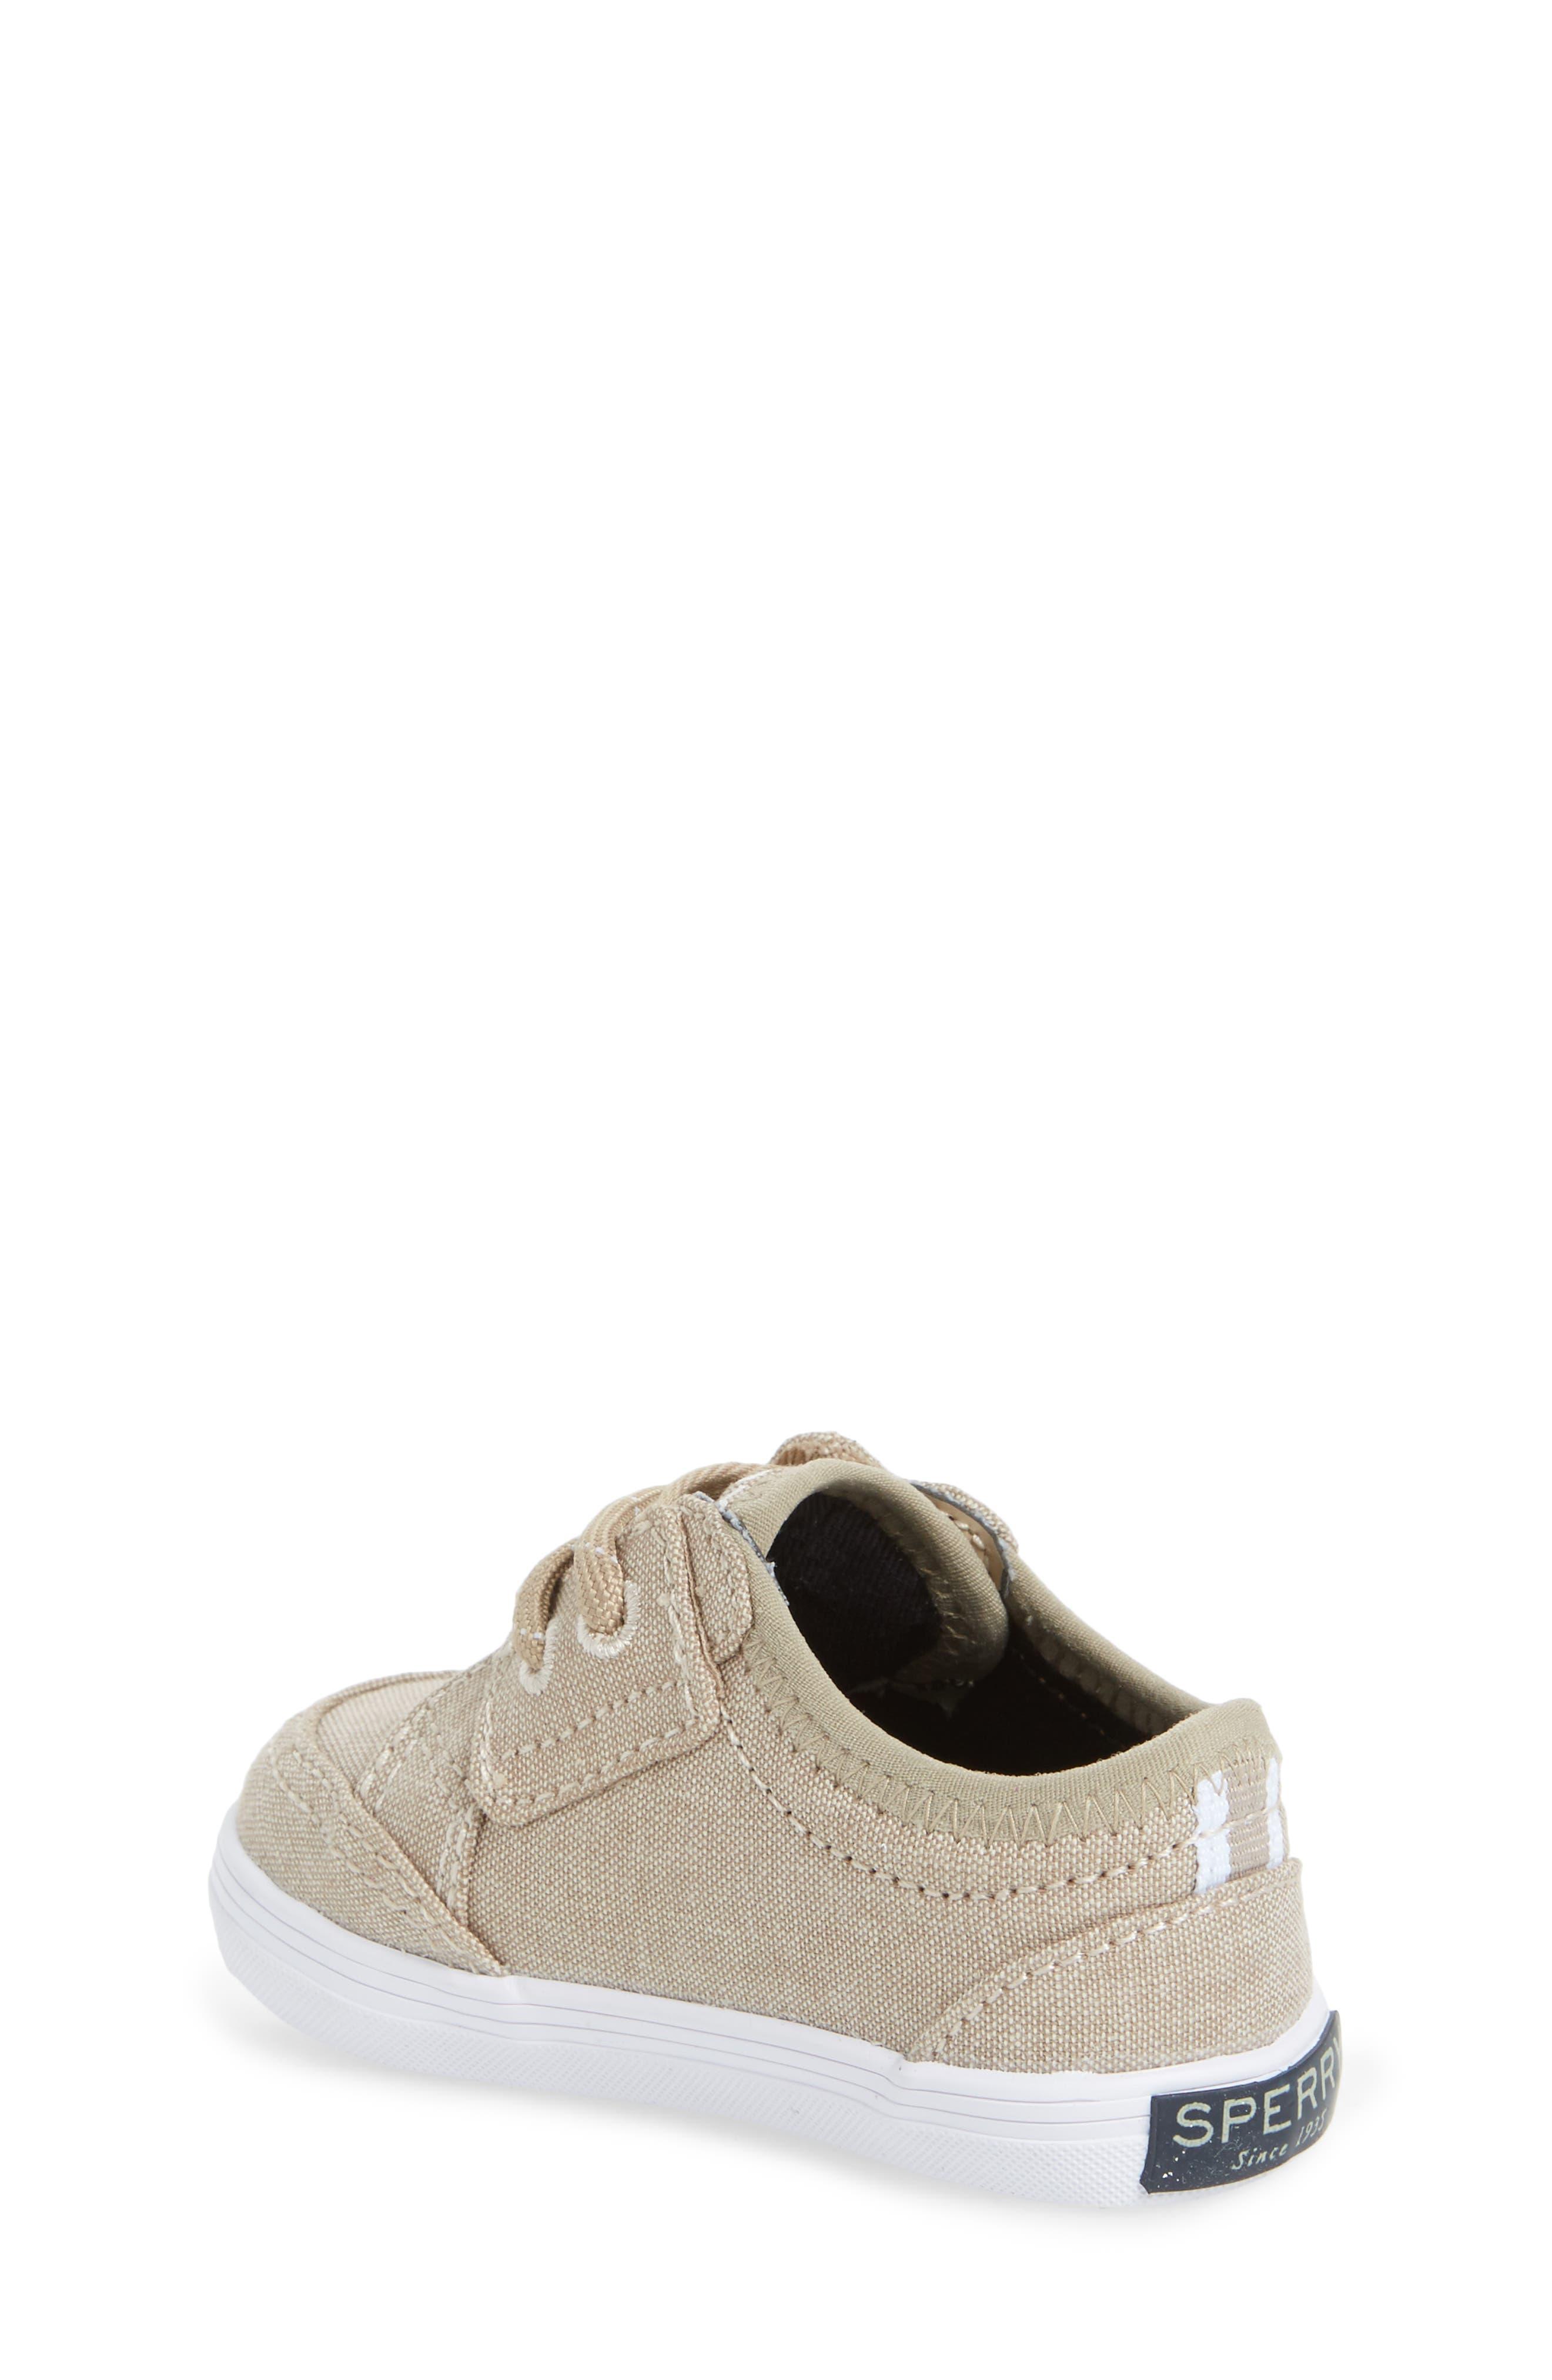 Deckfin Crib Jr. Sneaker,                             Alternate thumbnail 2, color,                             200